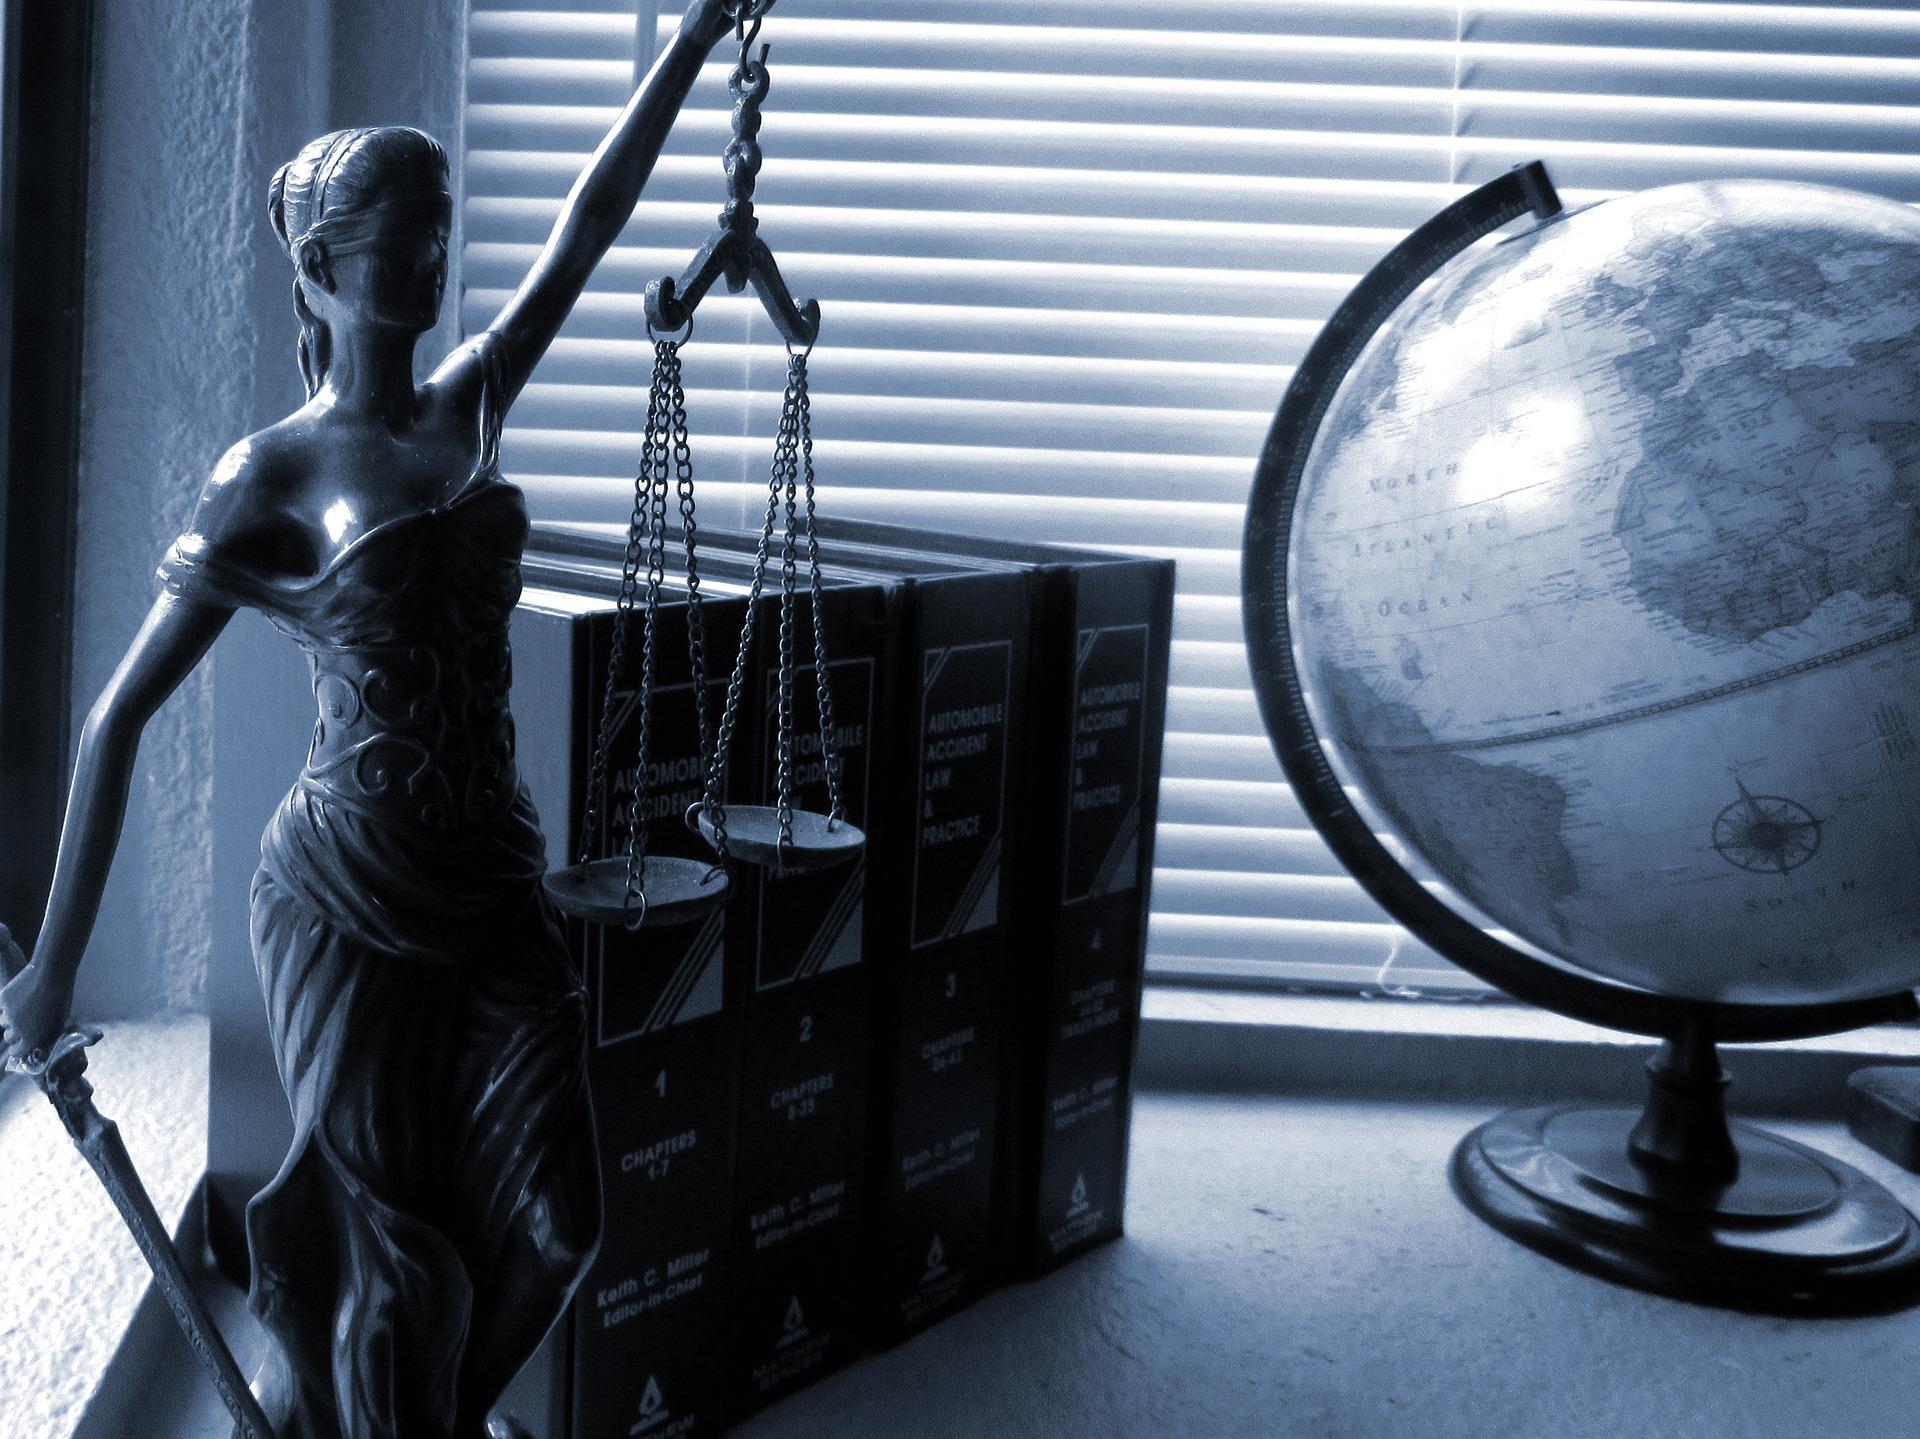 gerichte_jessica45__lady-justice-2388500_1920.jpg